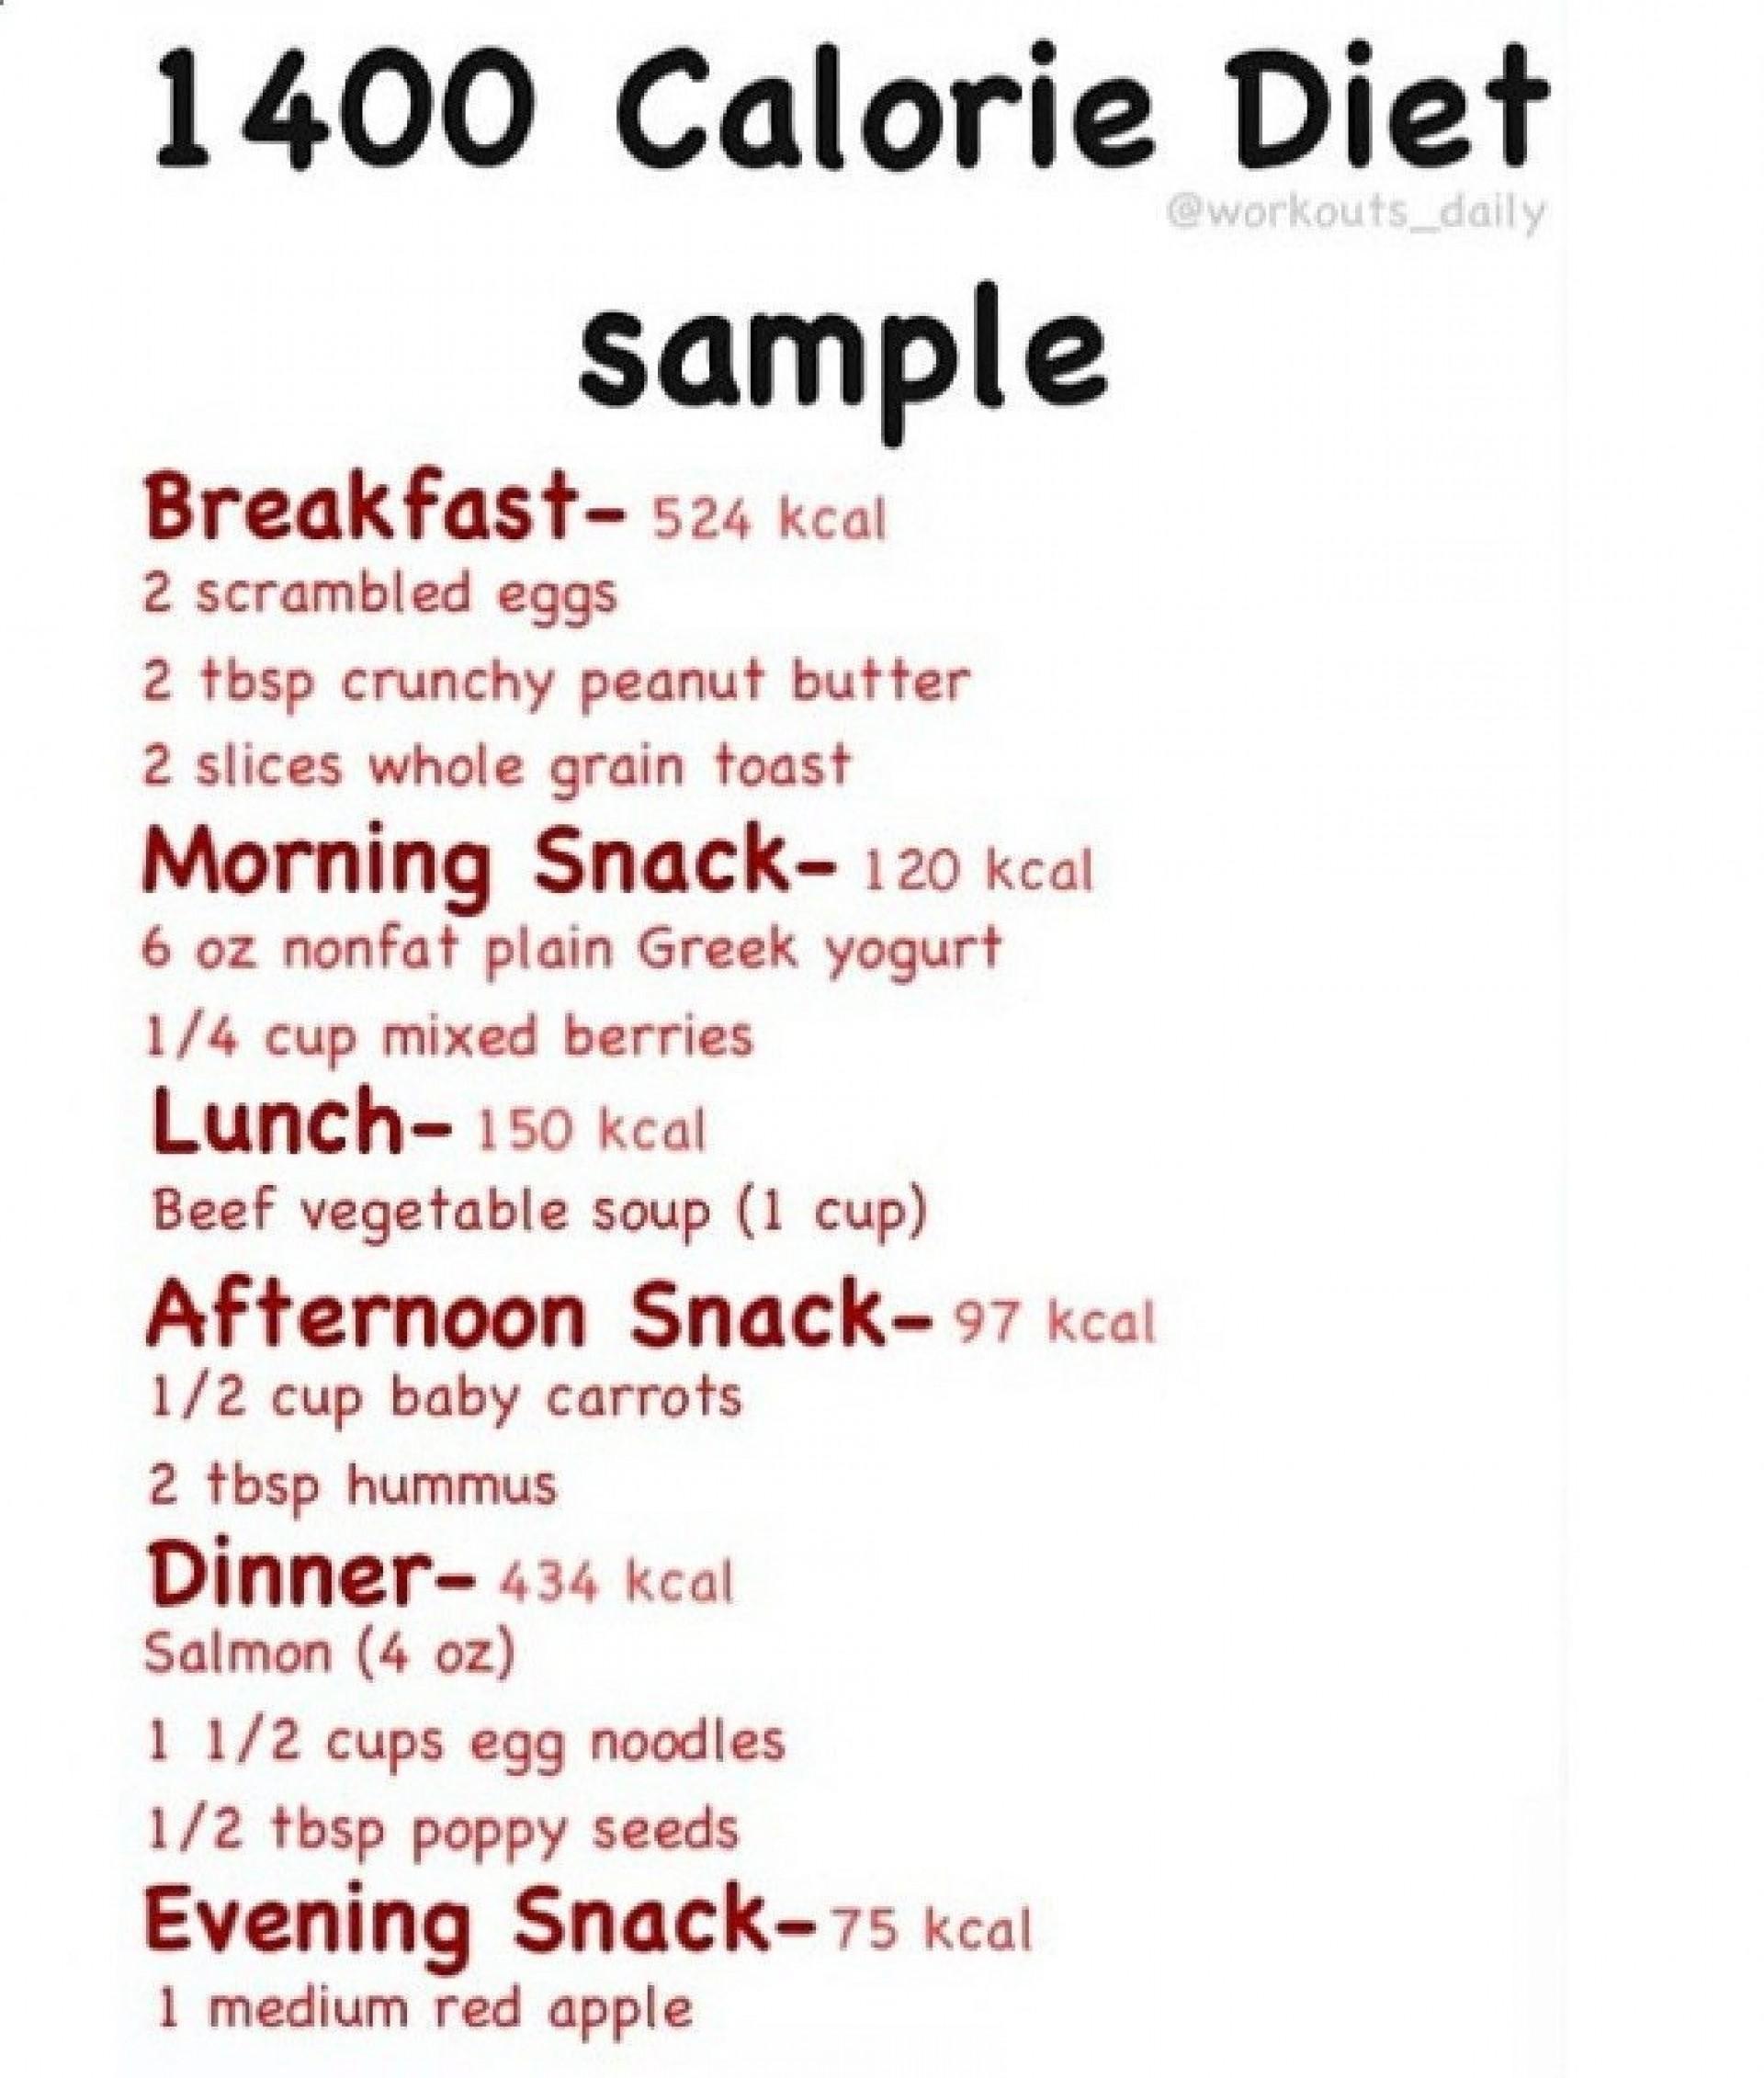 006 Unbelievable Sample 1500 Calorie Meal Plan Pdf Example 1920